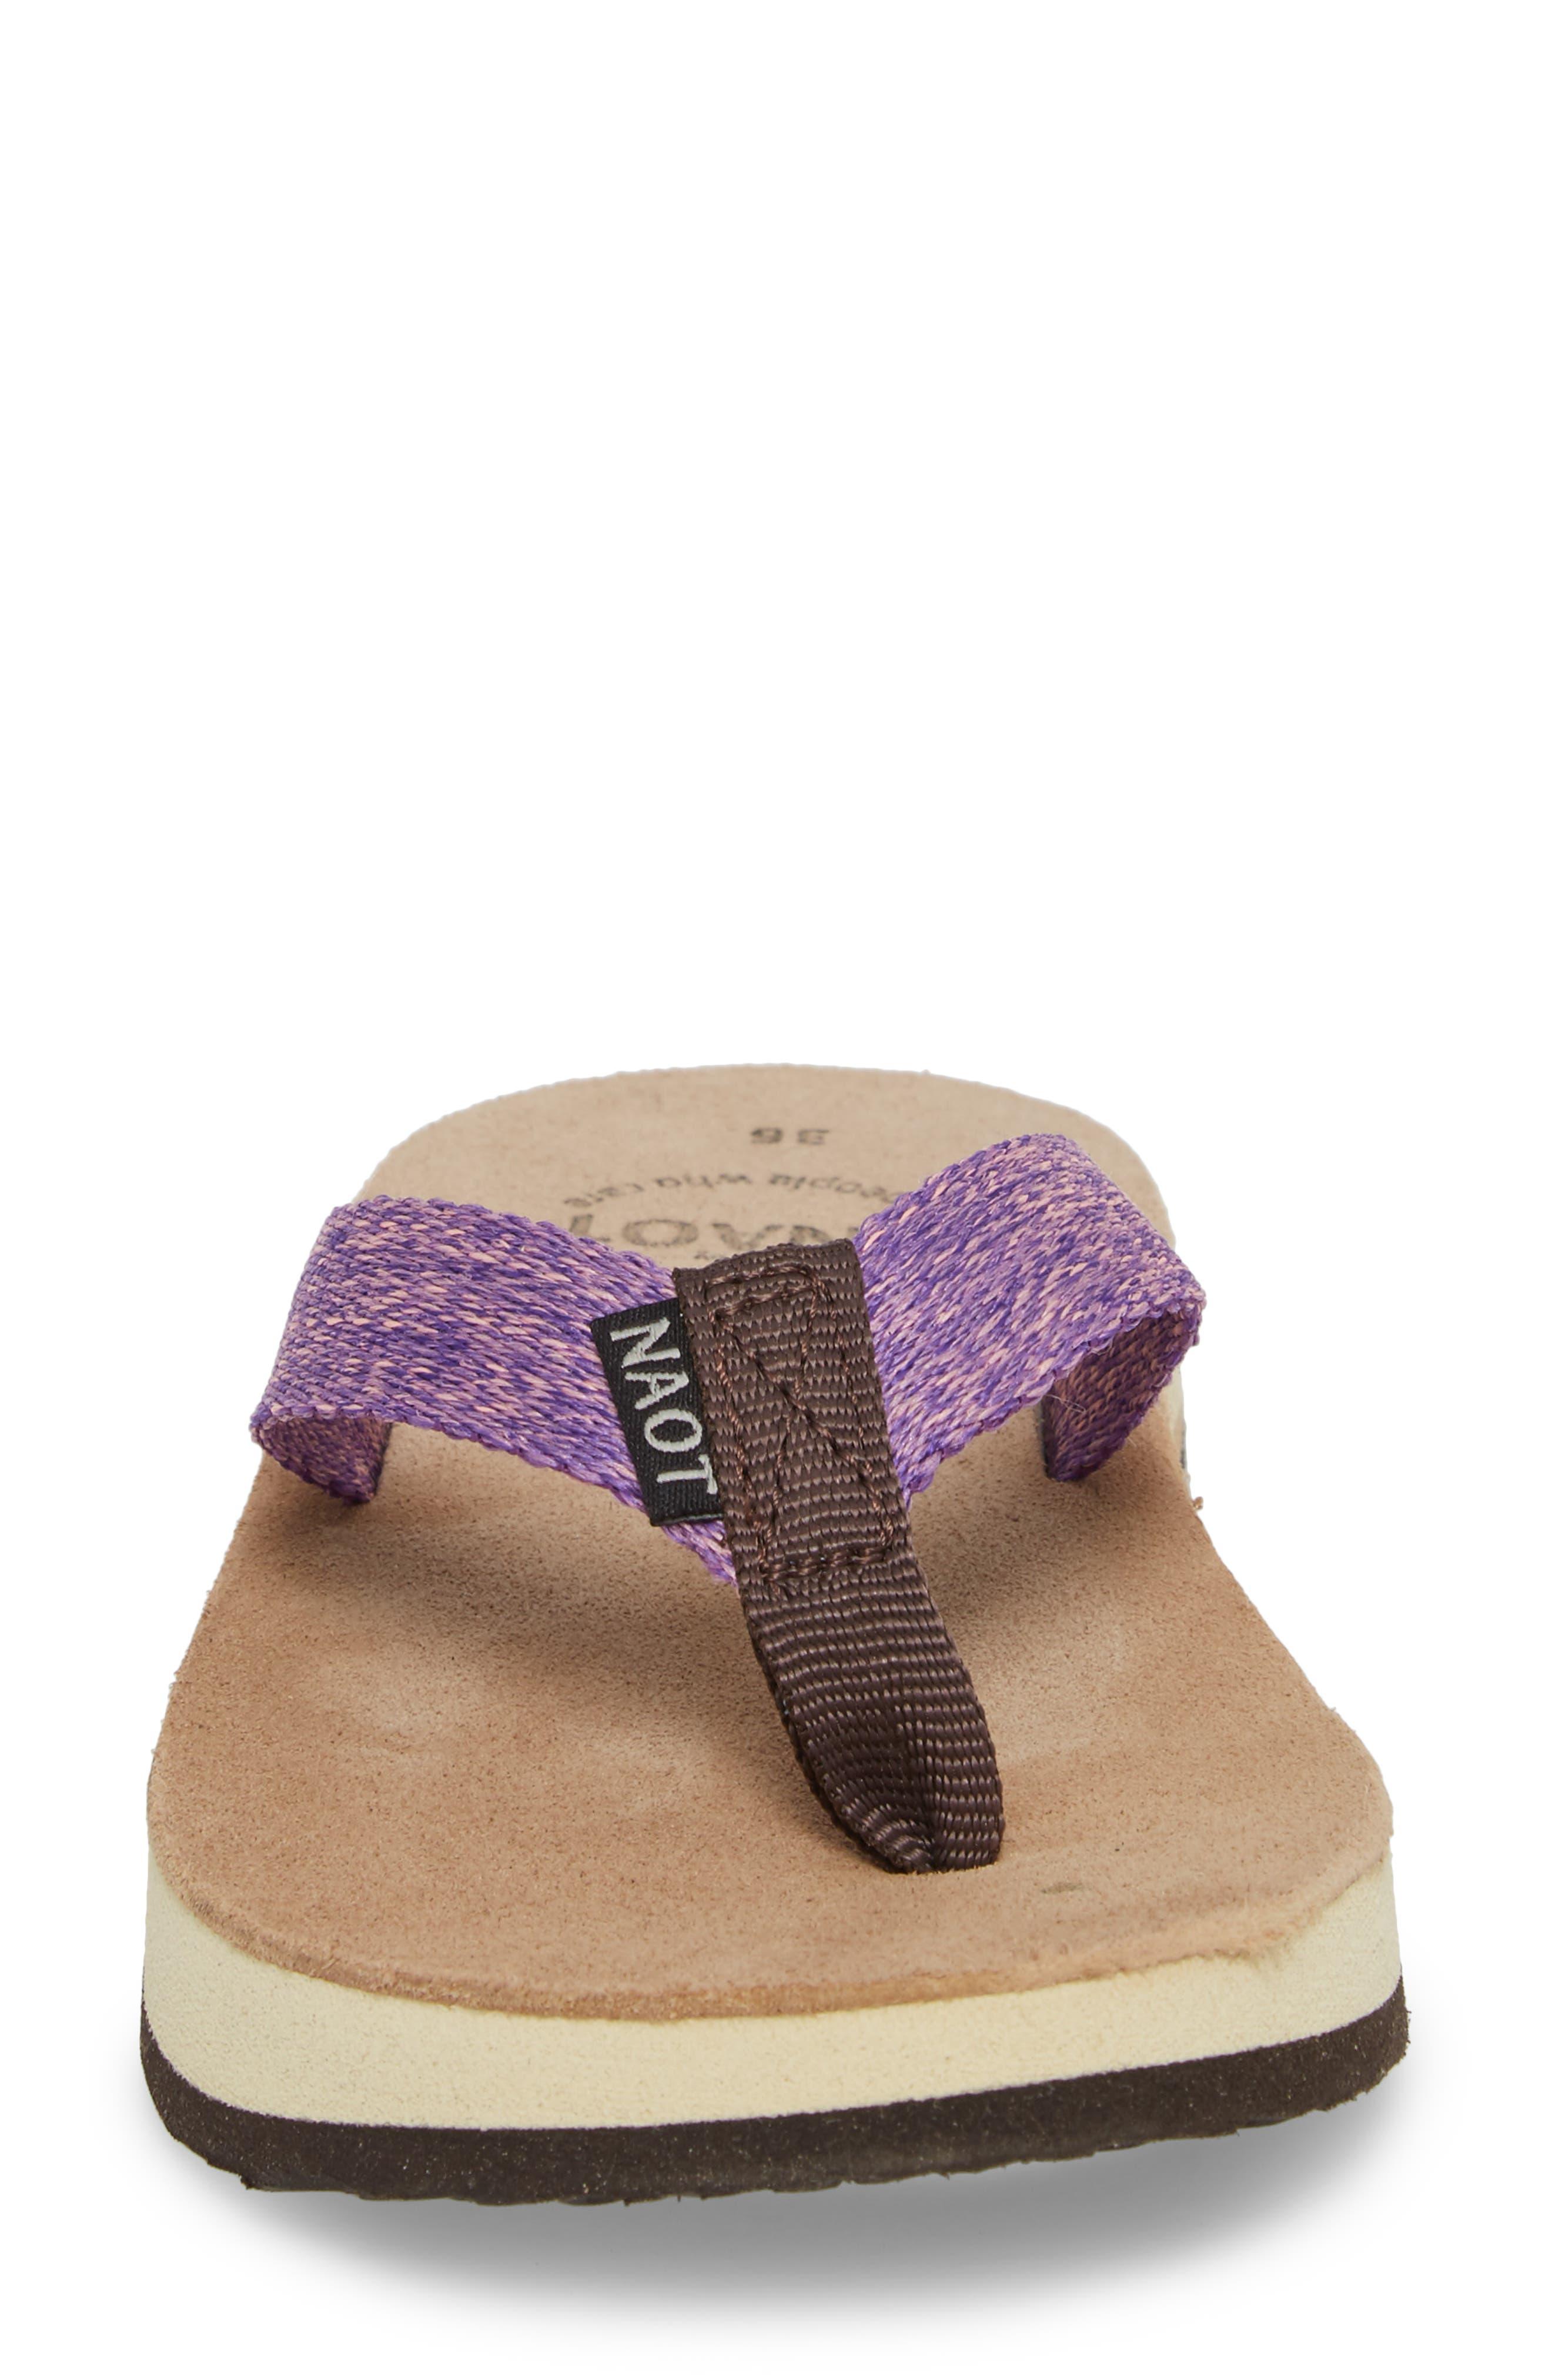 Island Flip Flop,                             Alternate thumbnail 4, color,                             Purple Lilac Fabric